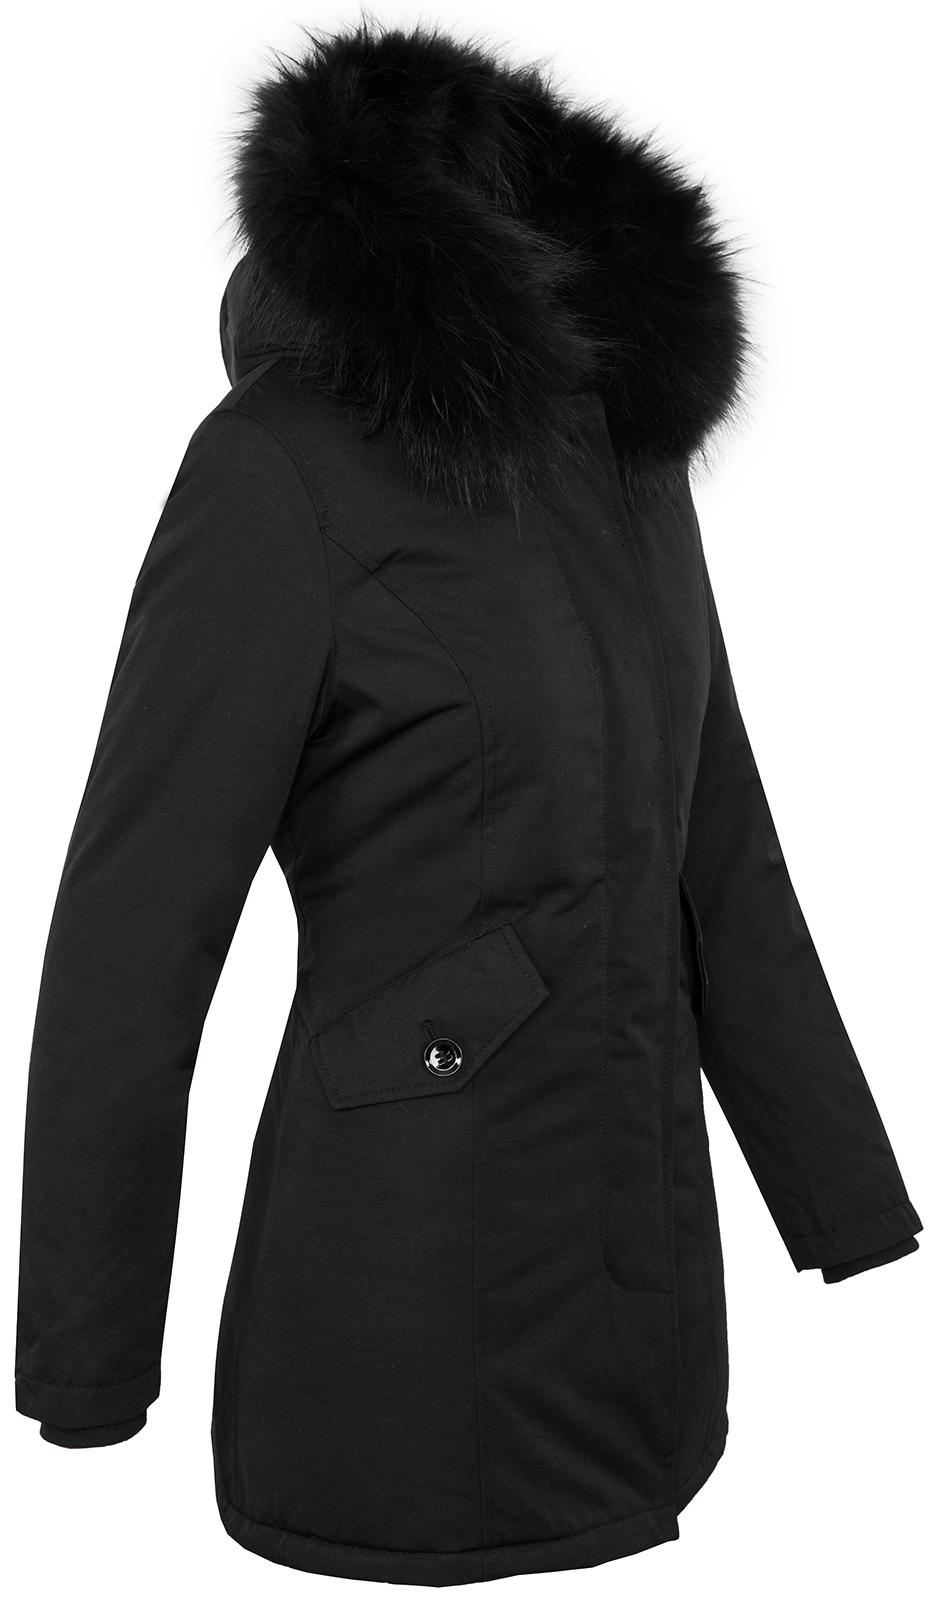 designer damen winter jacke parka mantel winterjacke gef ttert 36 38 40 42 d 218 ebay. Black Bedroom Furniture Sets. Home Design Ideas